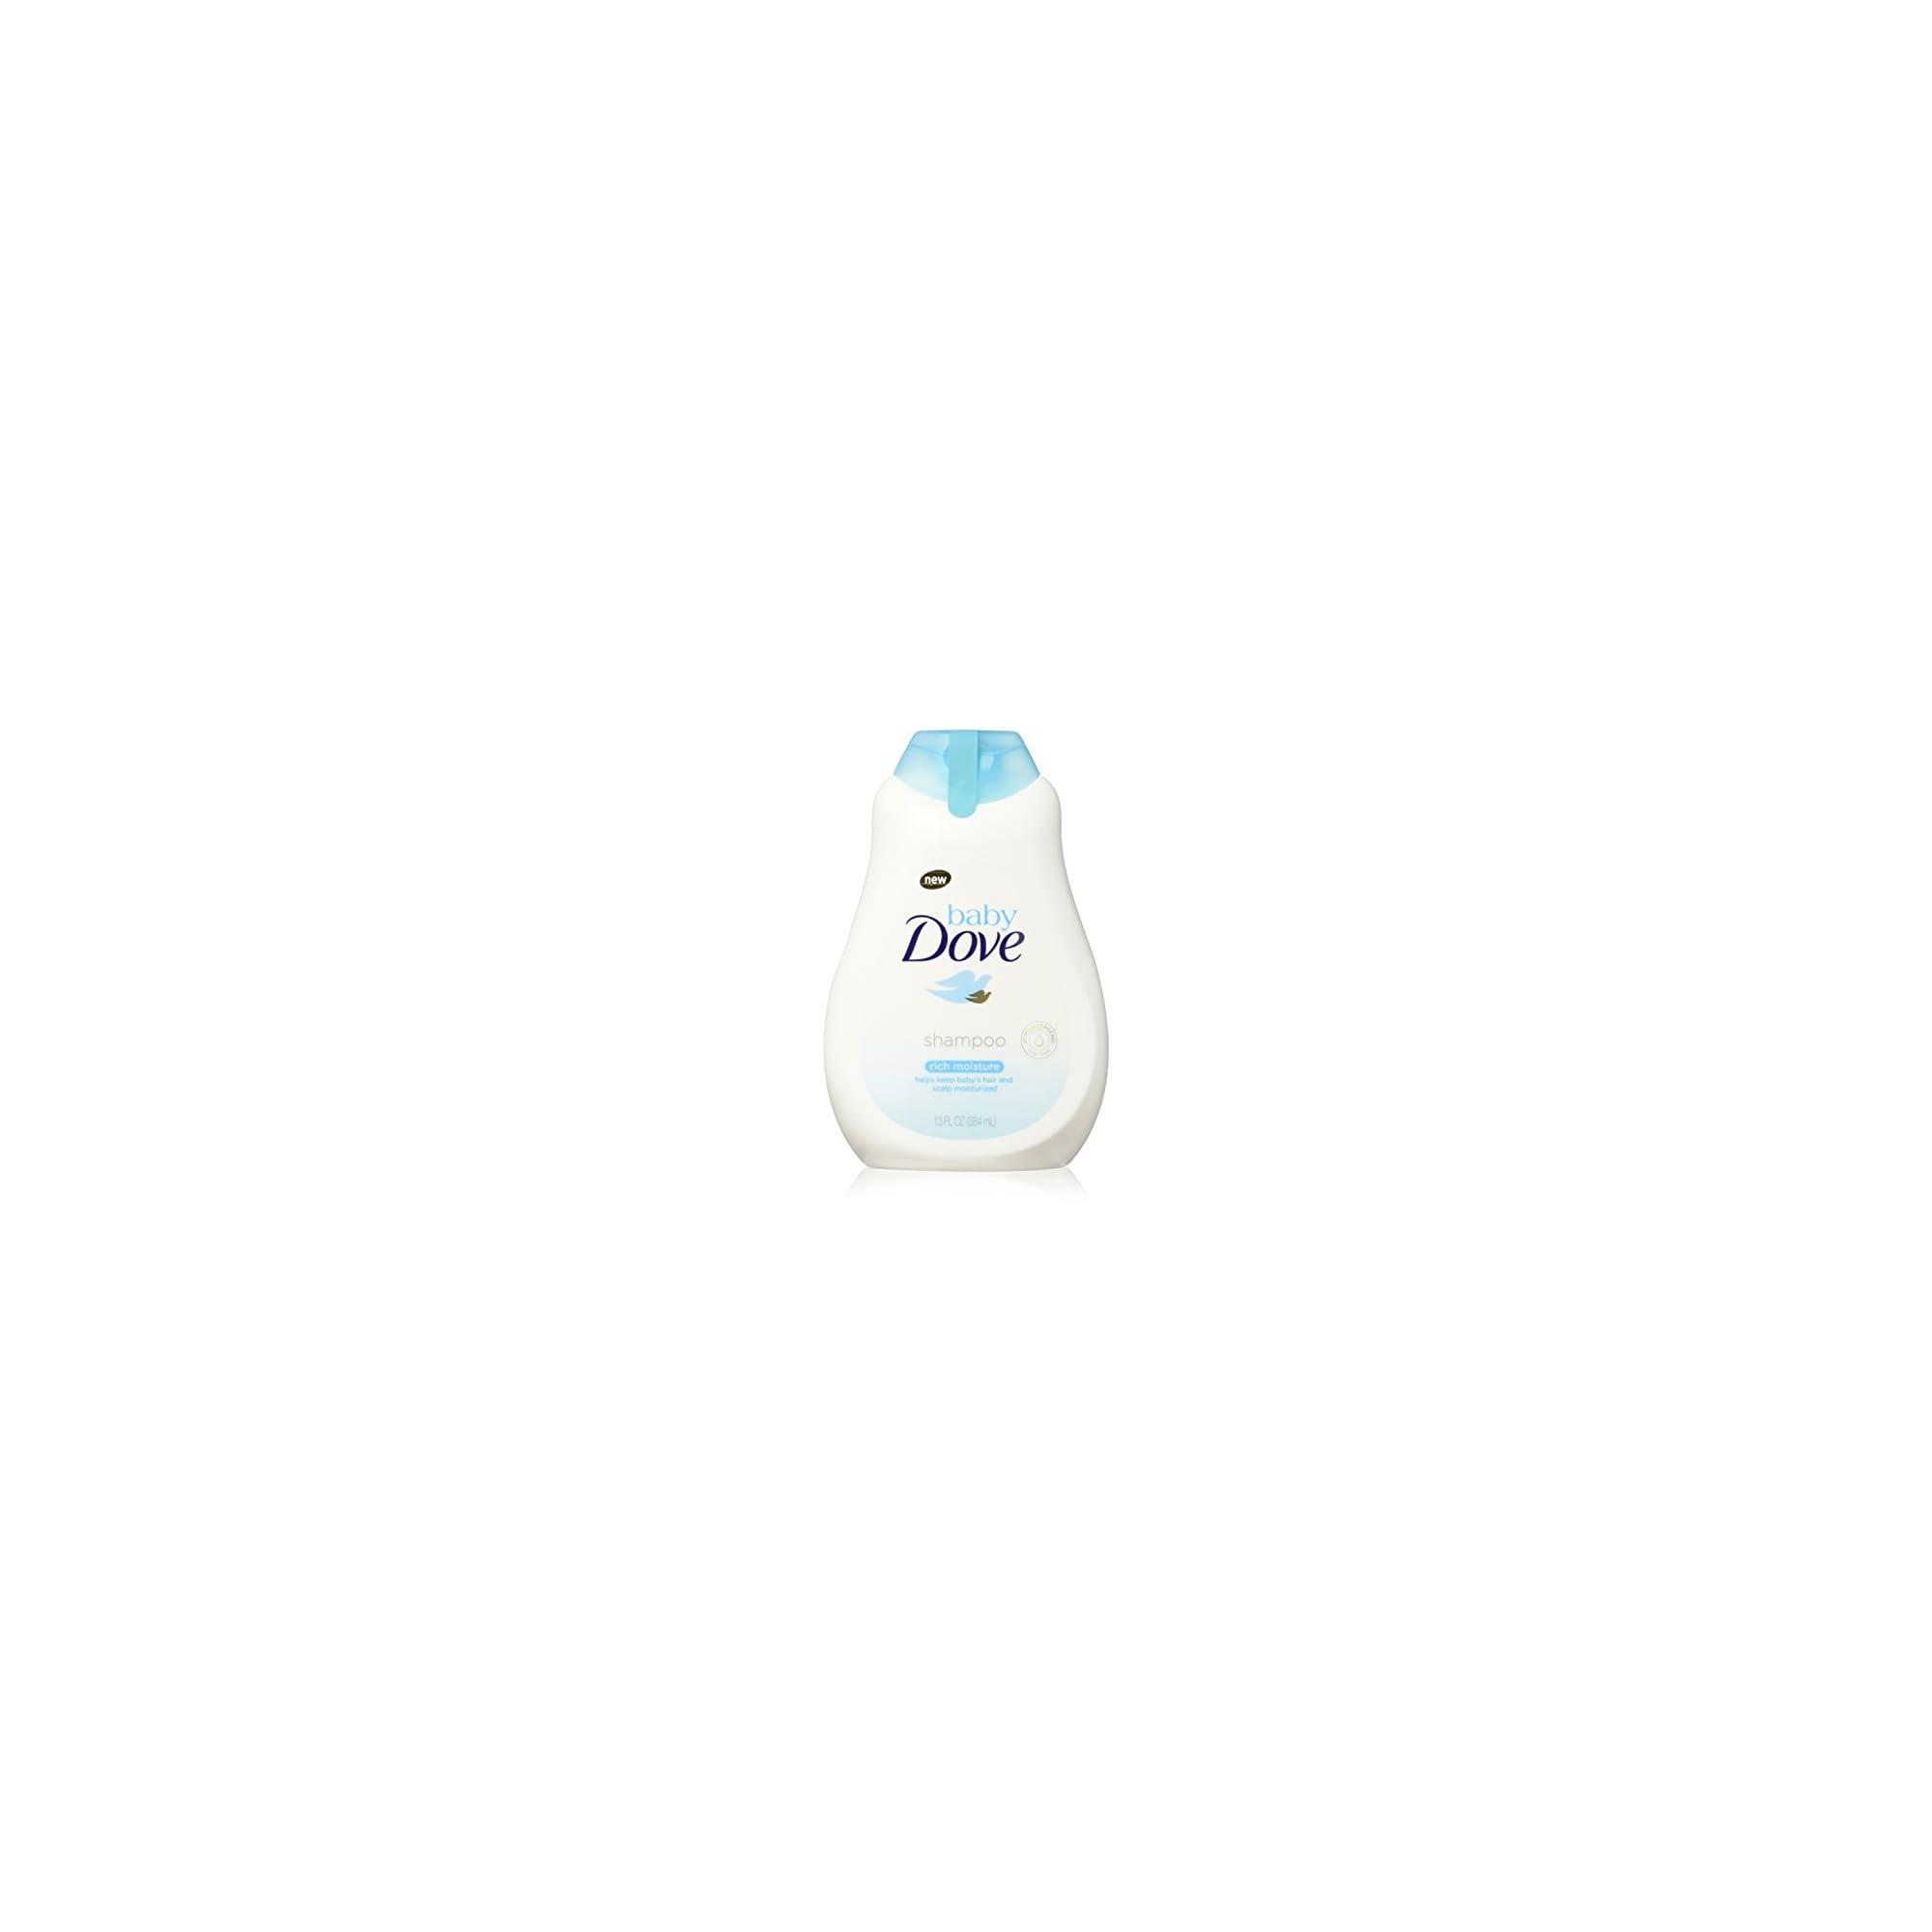 Baby Dove Tear Free Baby Shampoo Rich Moisture 13 oz, 3 count